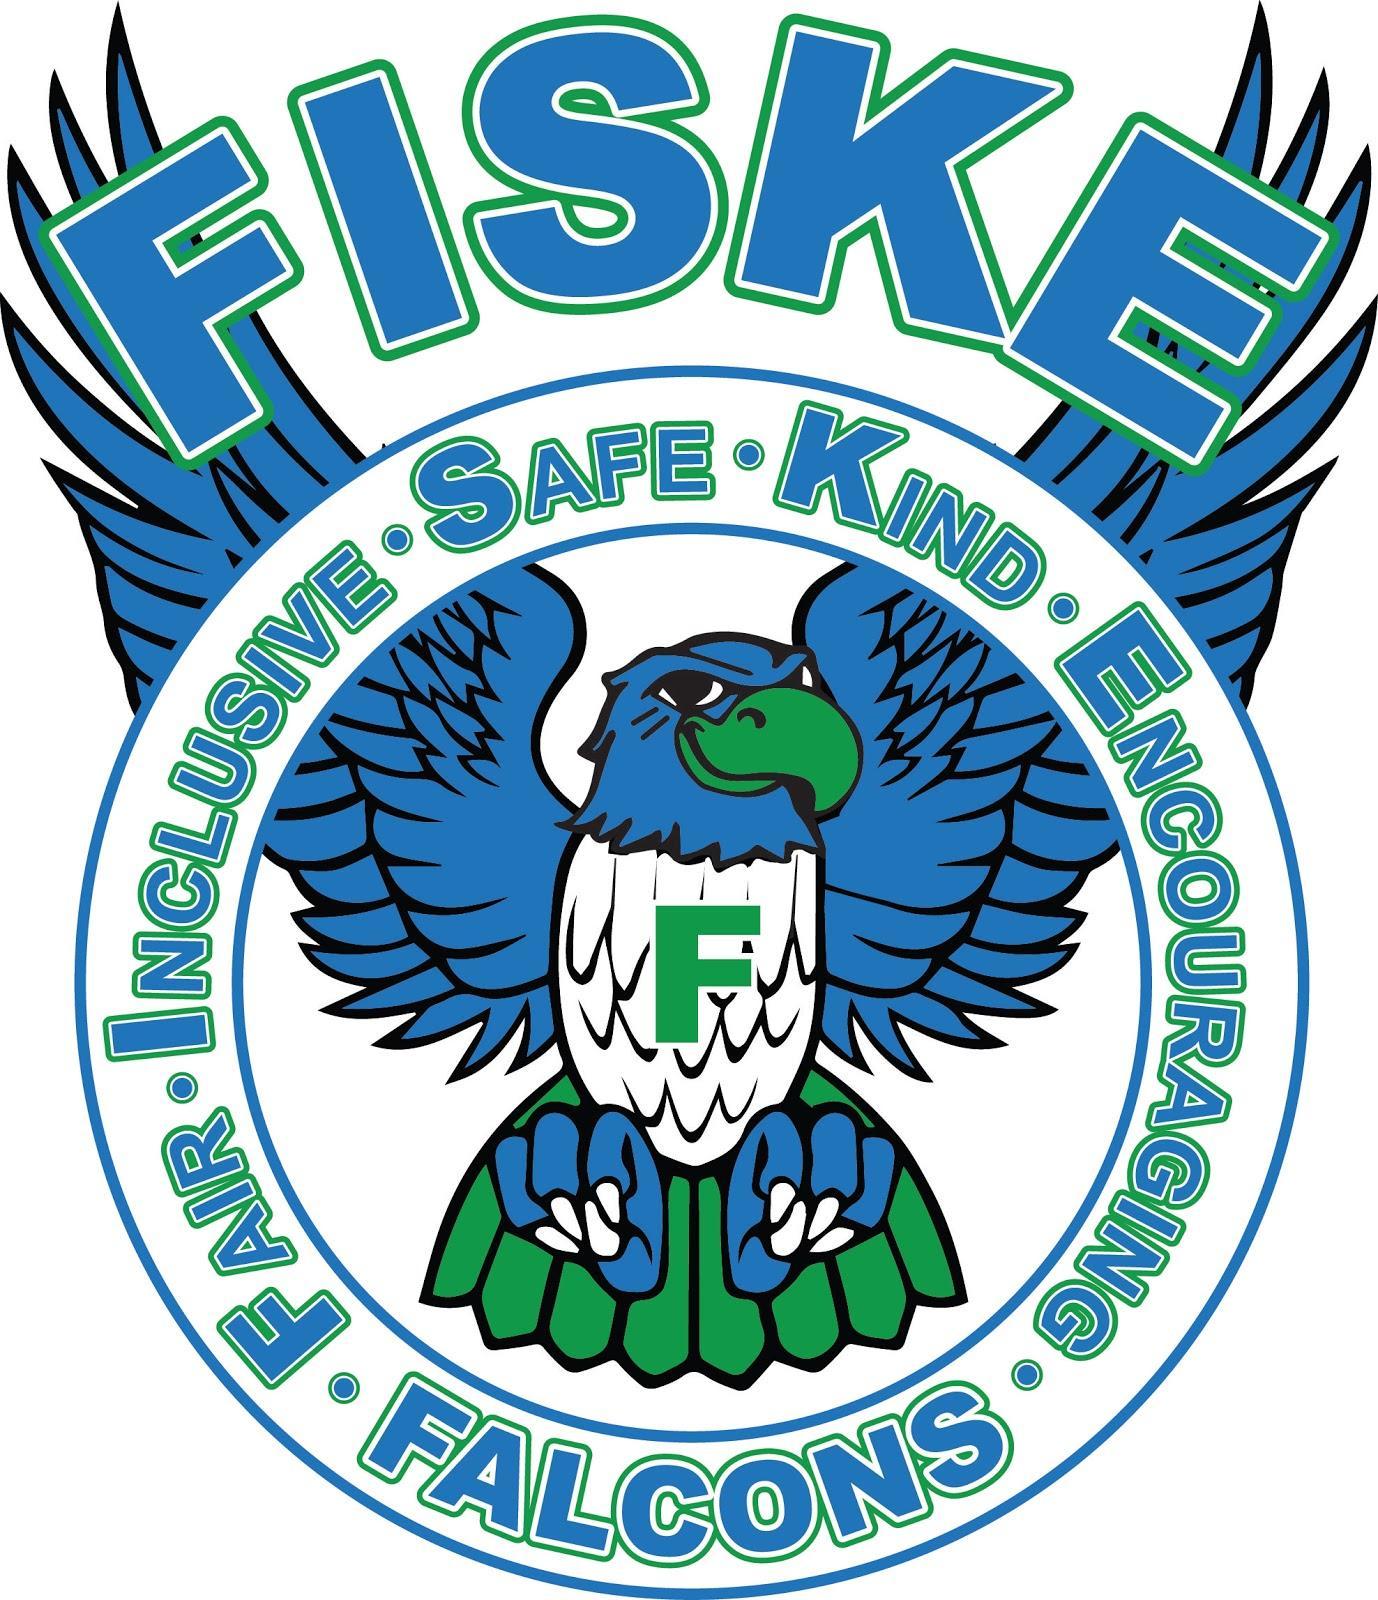 Fiske Falcon logo